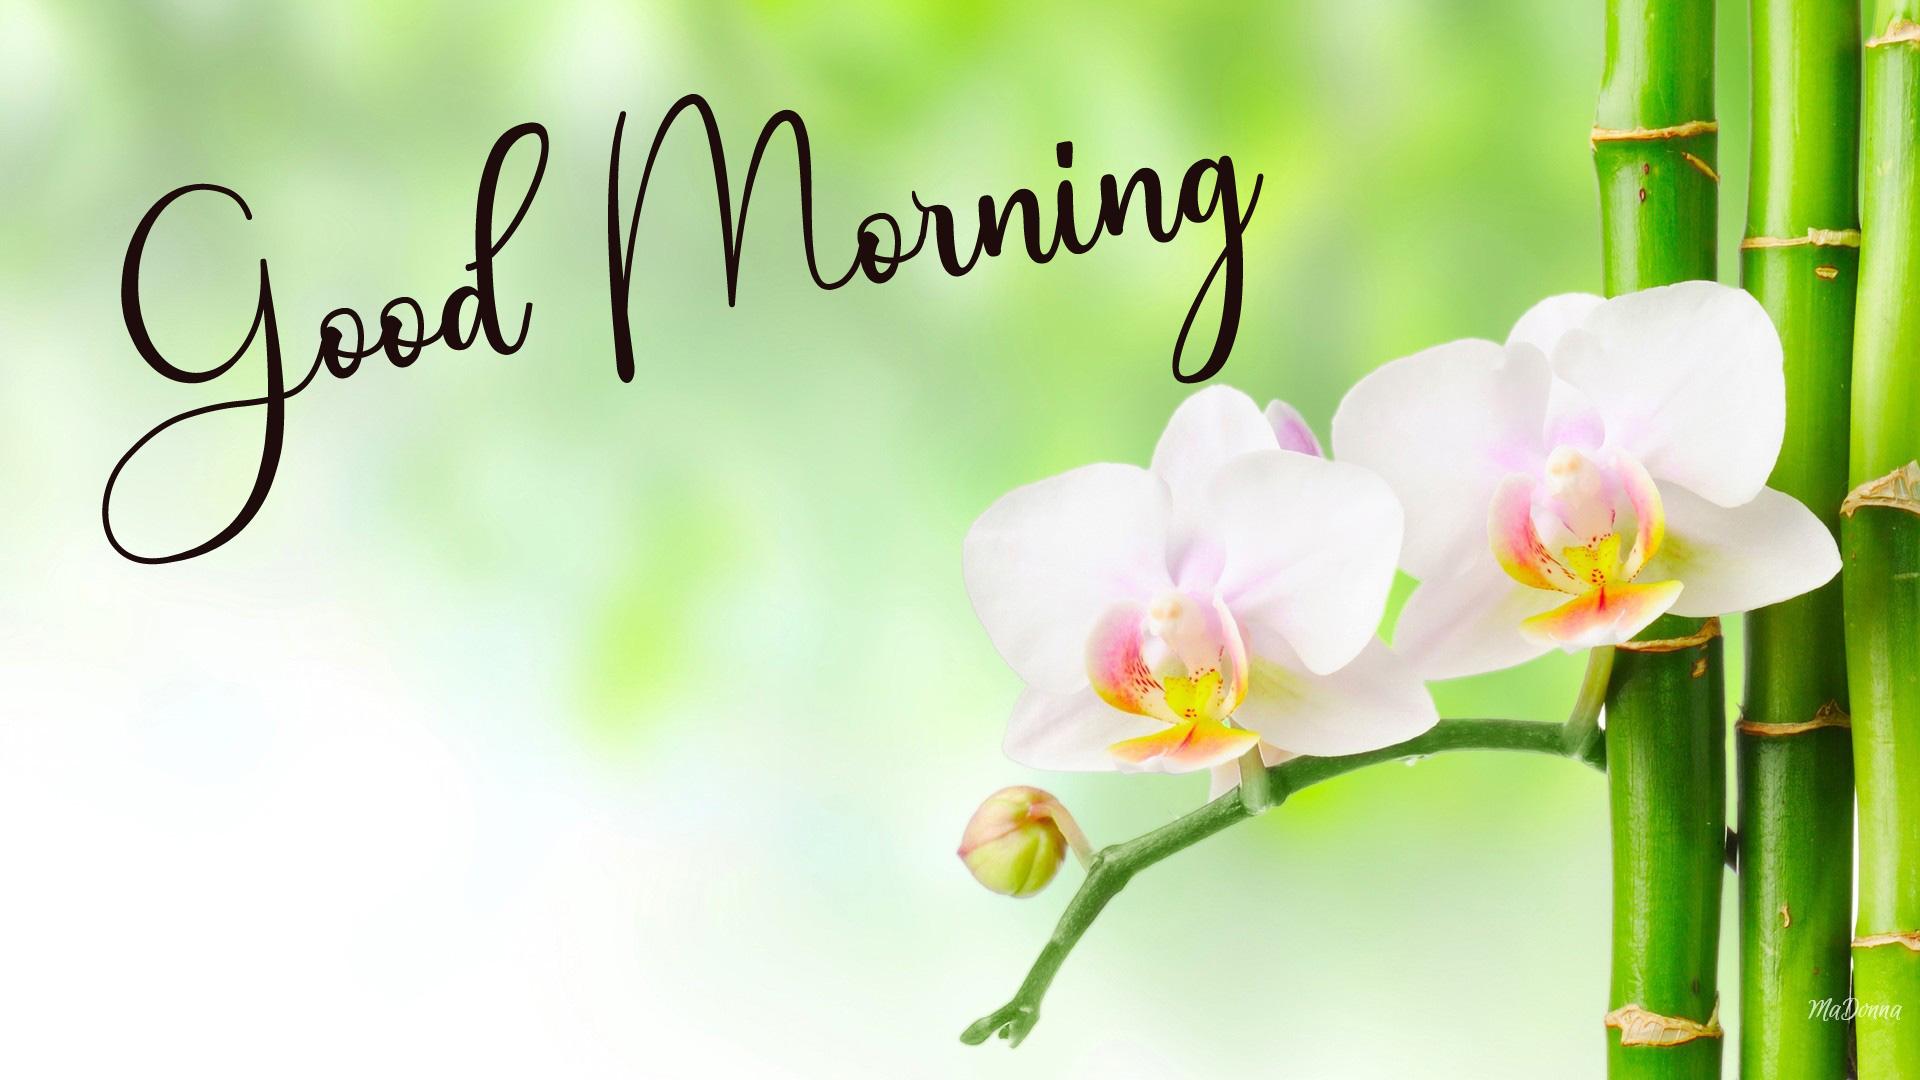 Good Morning Photo Free Download 1